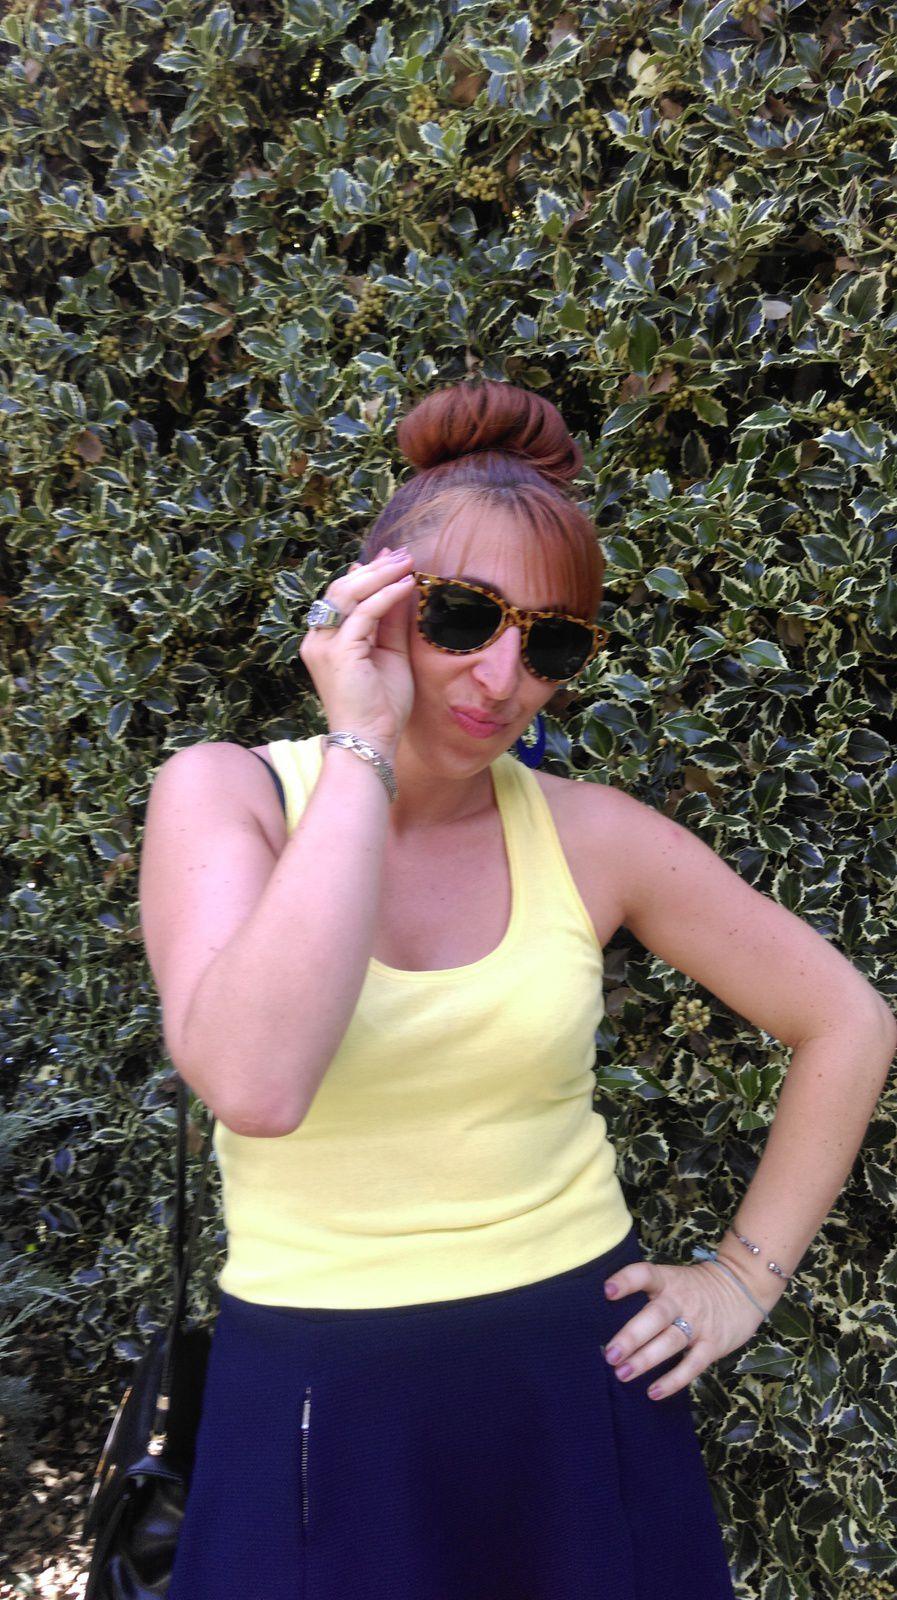 Jupe BABOU - Top MIM - Sandales BESSON - Sac NINA RICCI - Tatouage temporaire : ALIEXPRESS